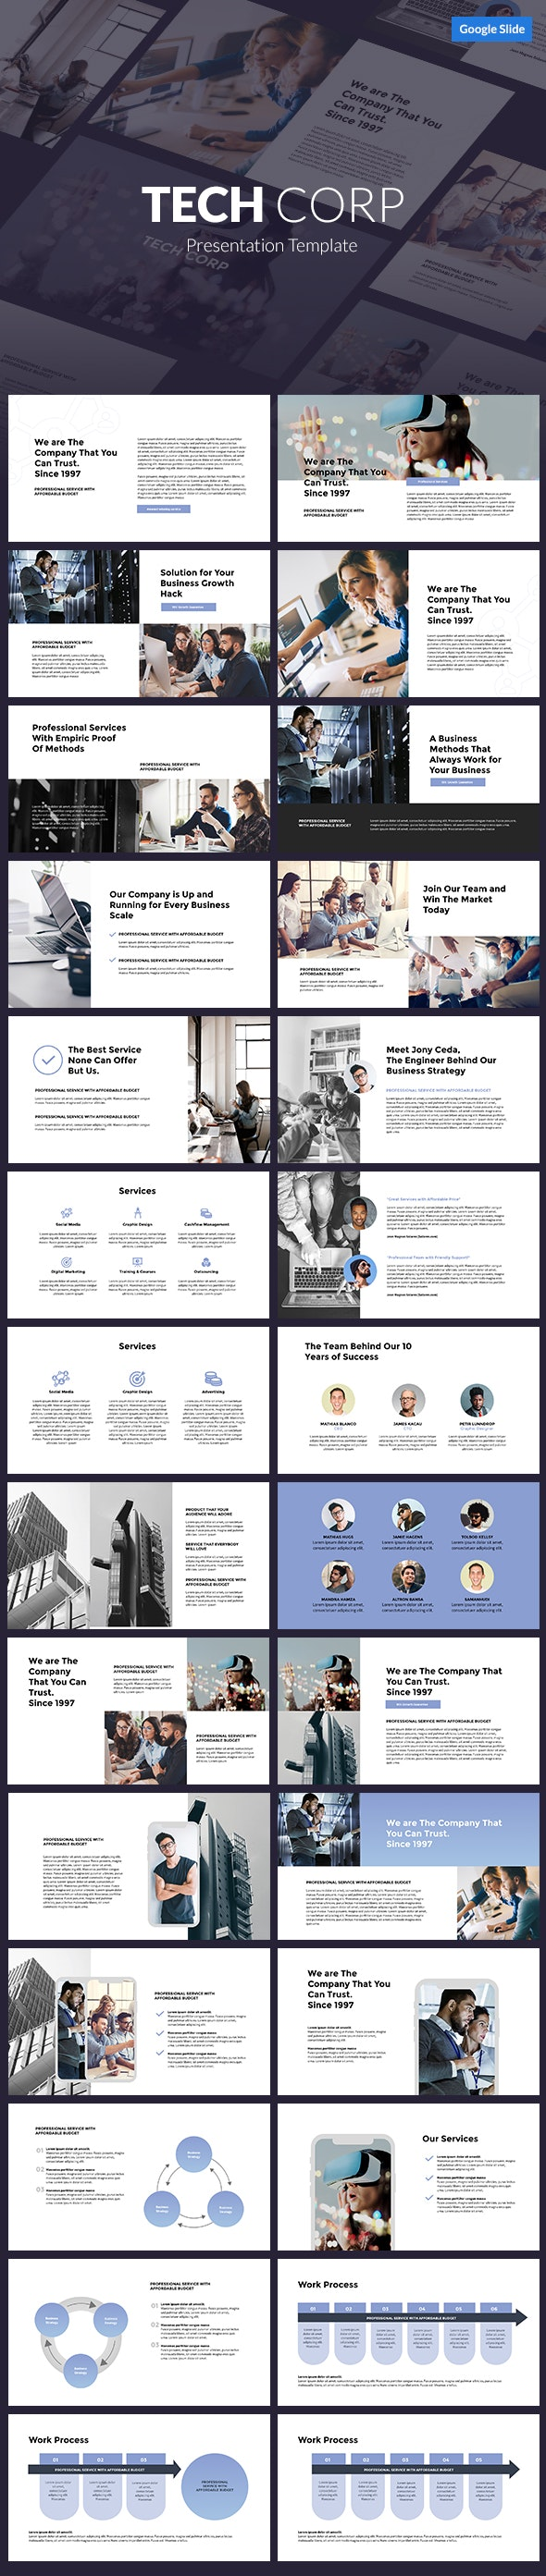 Tech Corp - Google Slides Template - Google Slides Presentation Templates